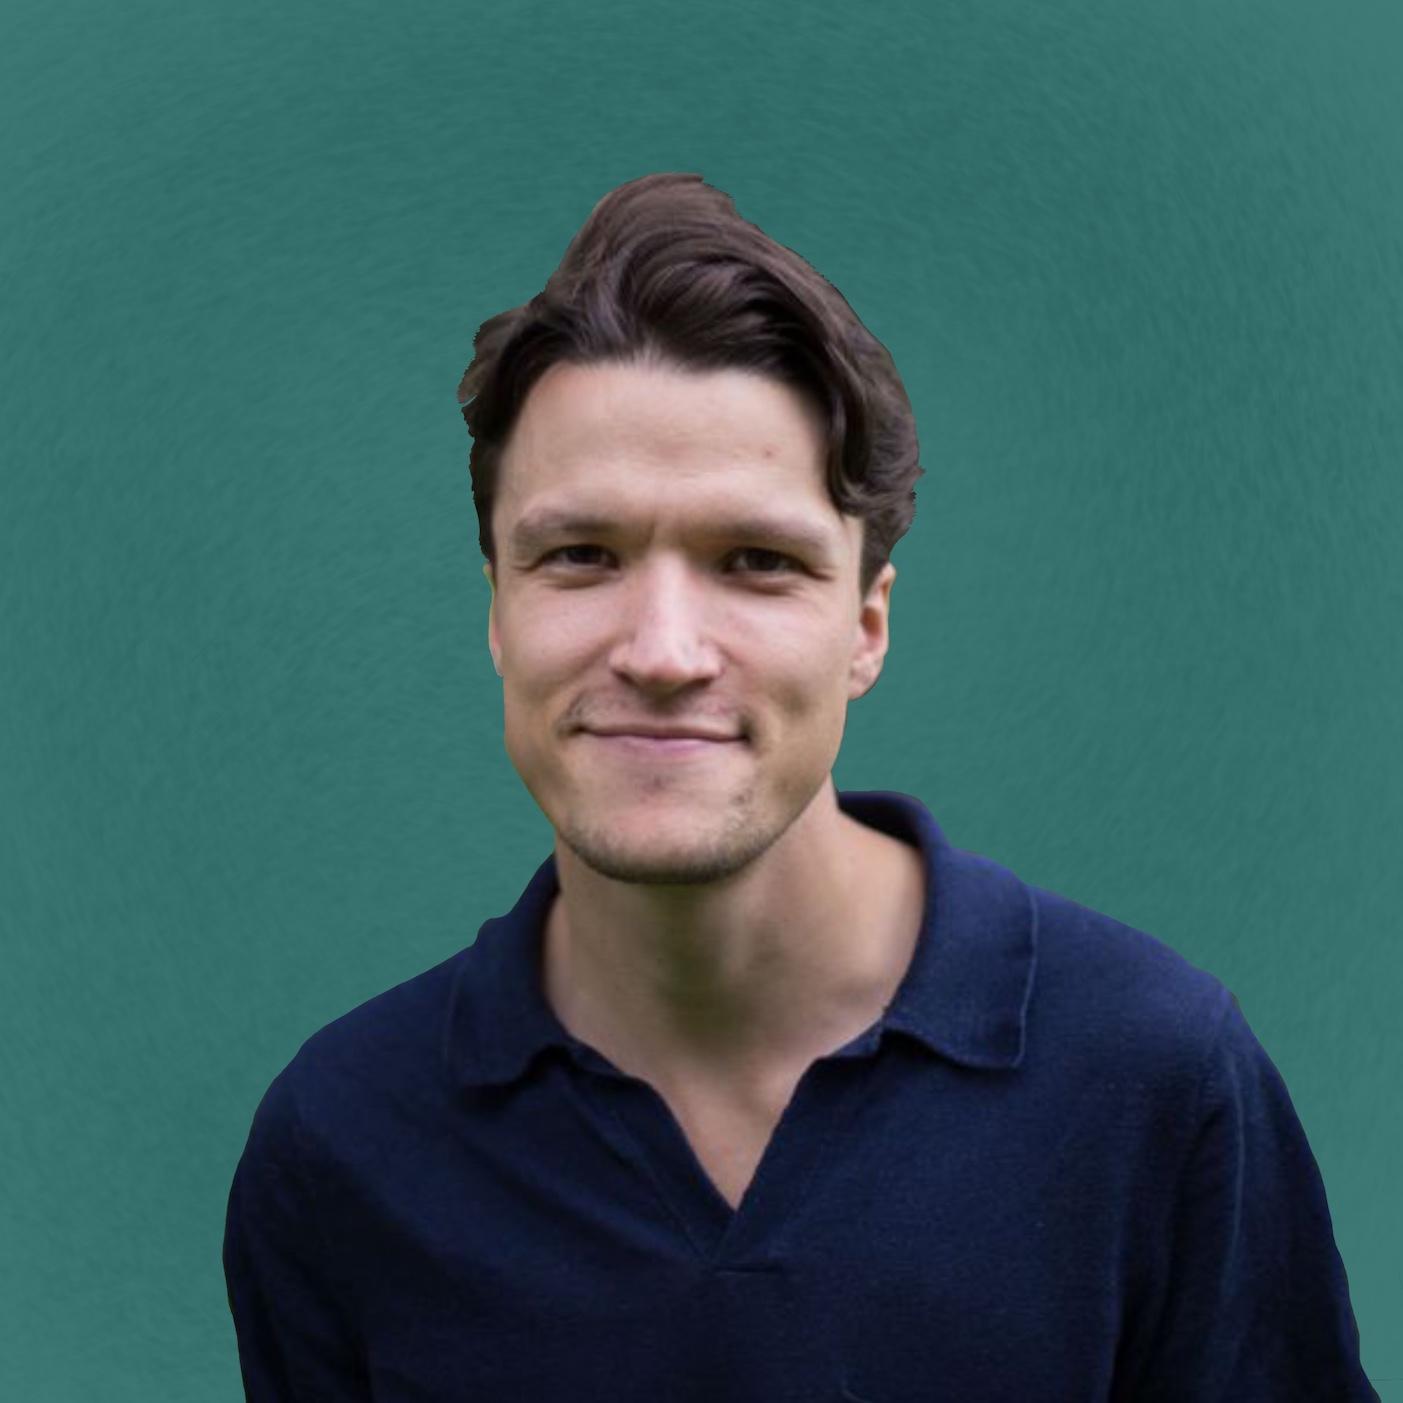 Ole Jørgen Grønli